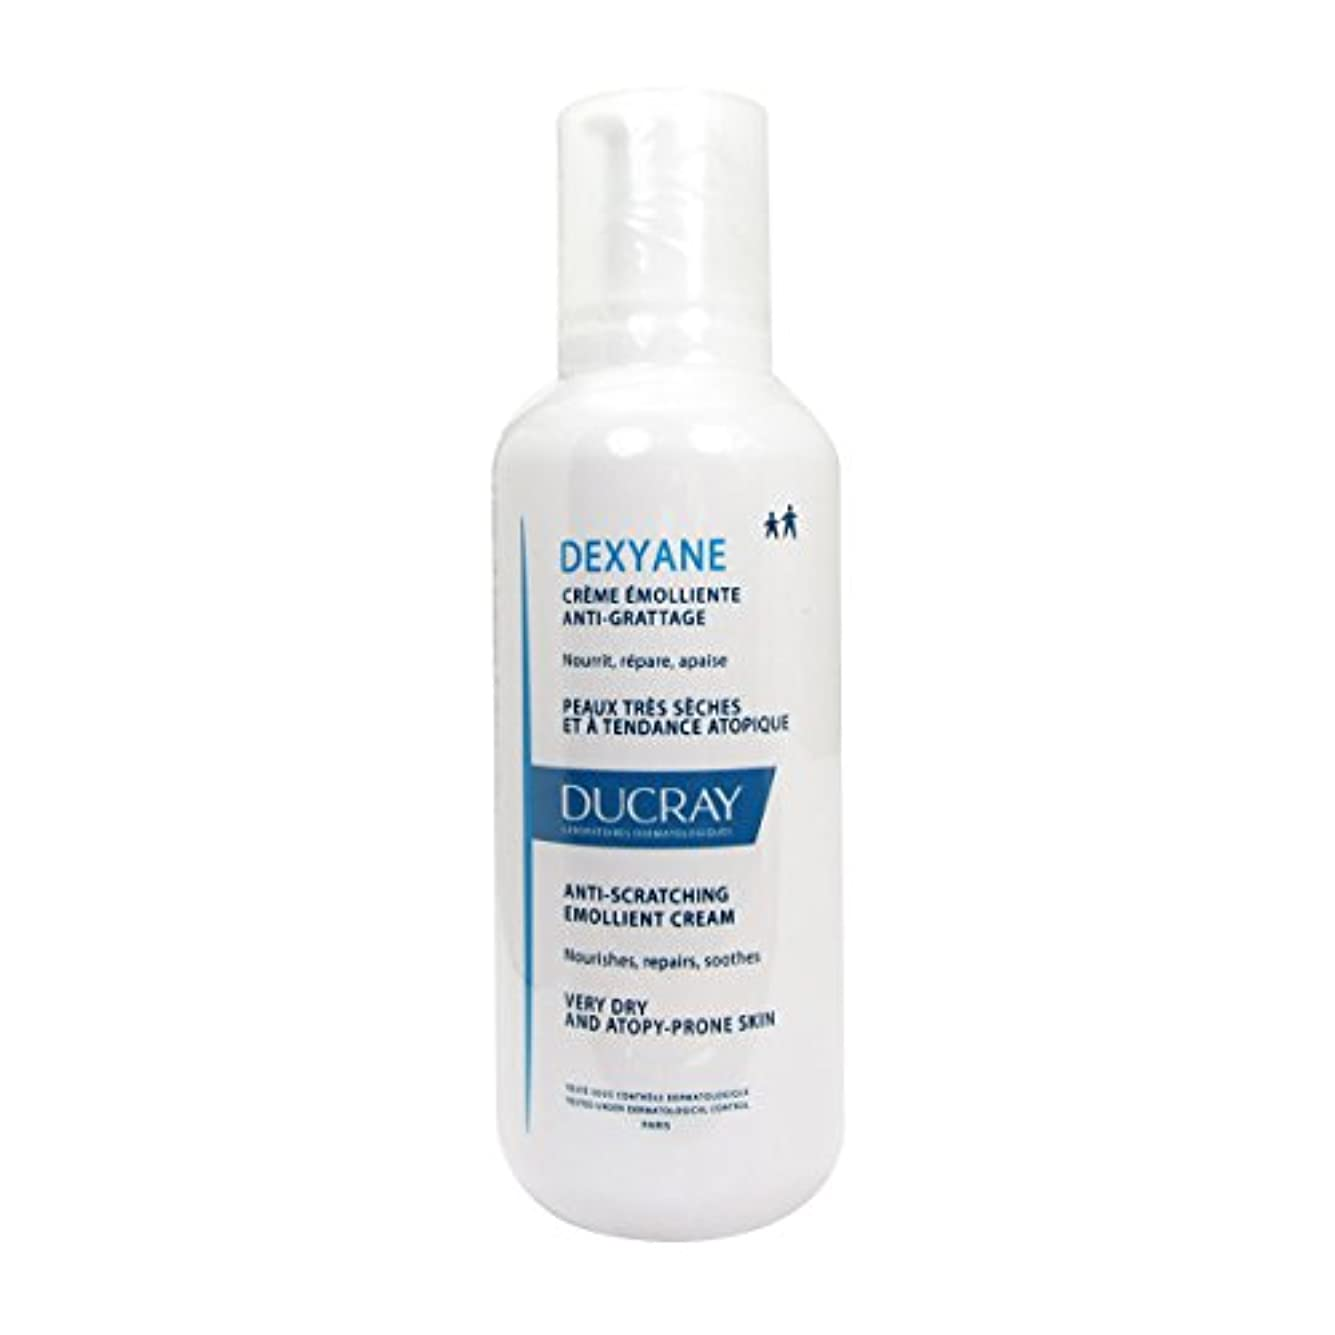 Ducray Dexyane Anti-scratching Emollient Cream 400ml [並行輸入品]